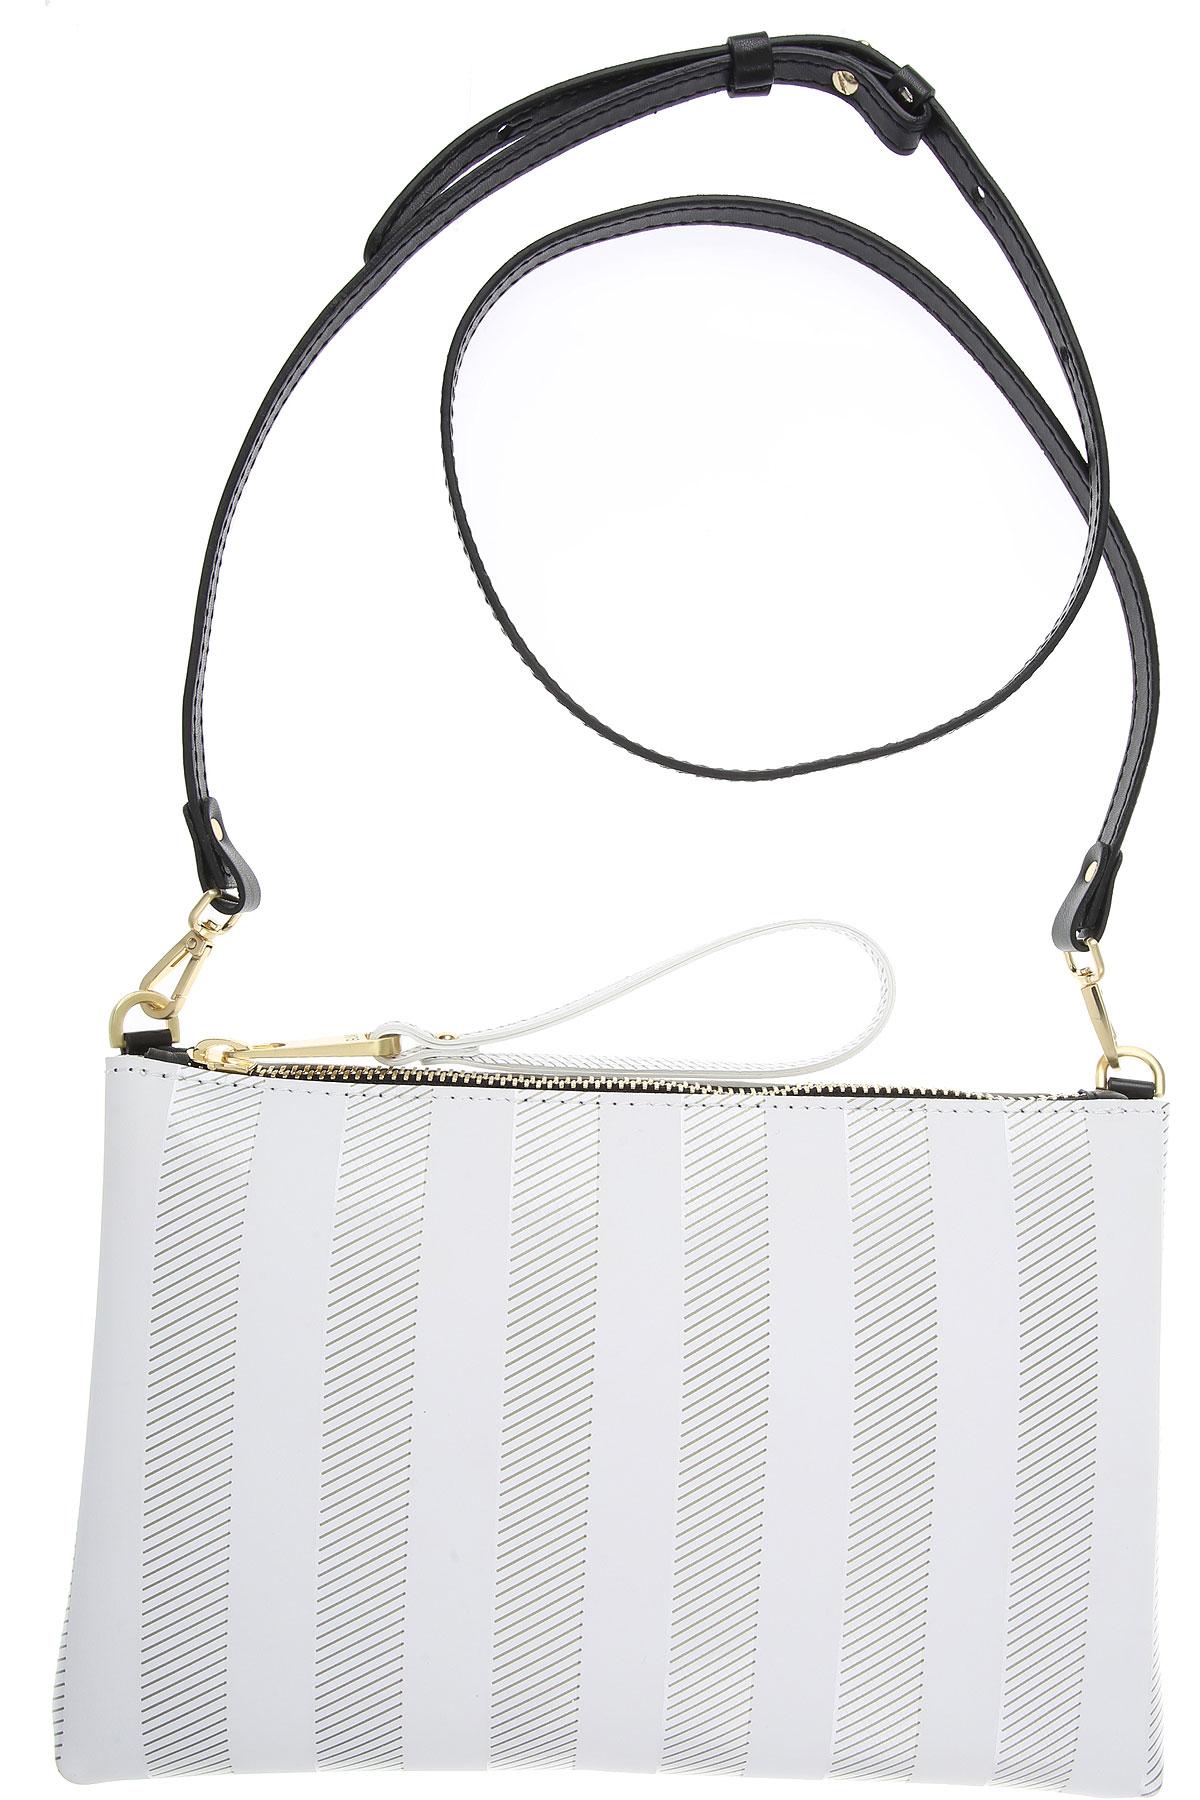 GUM Gianni Chiarini Design Shoulder Bag for Women On Sale, White, PVC, 2019